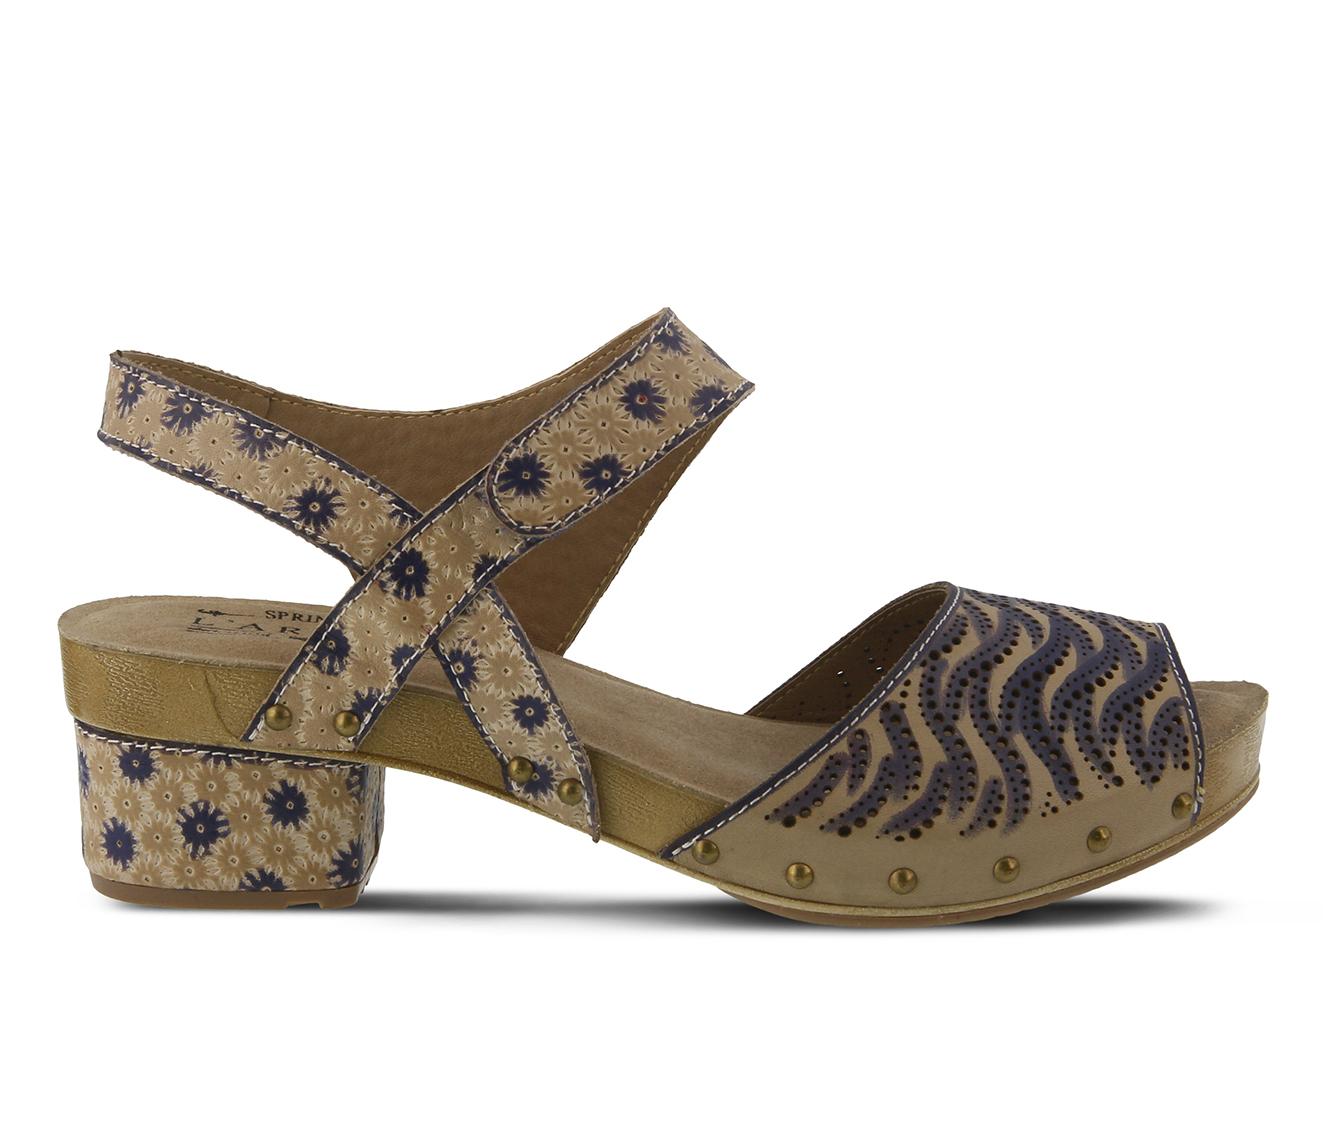 L'Artiste Gloga Women's Sandal (Beige Leather)